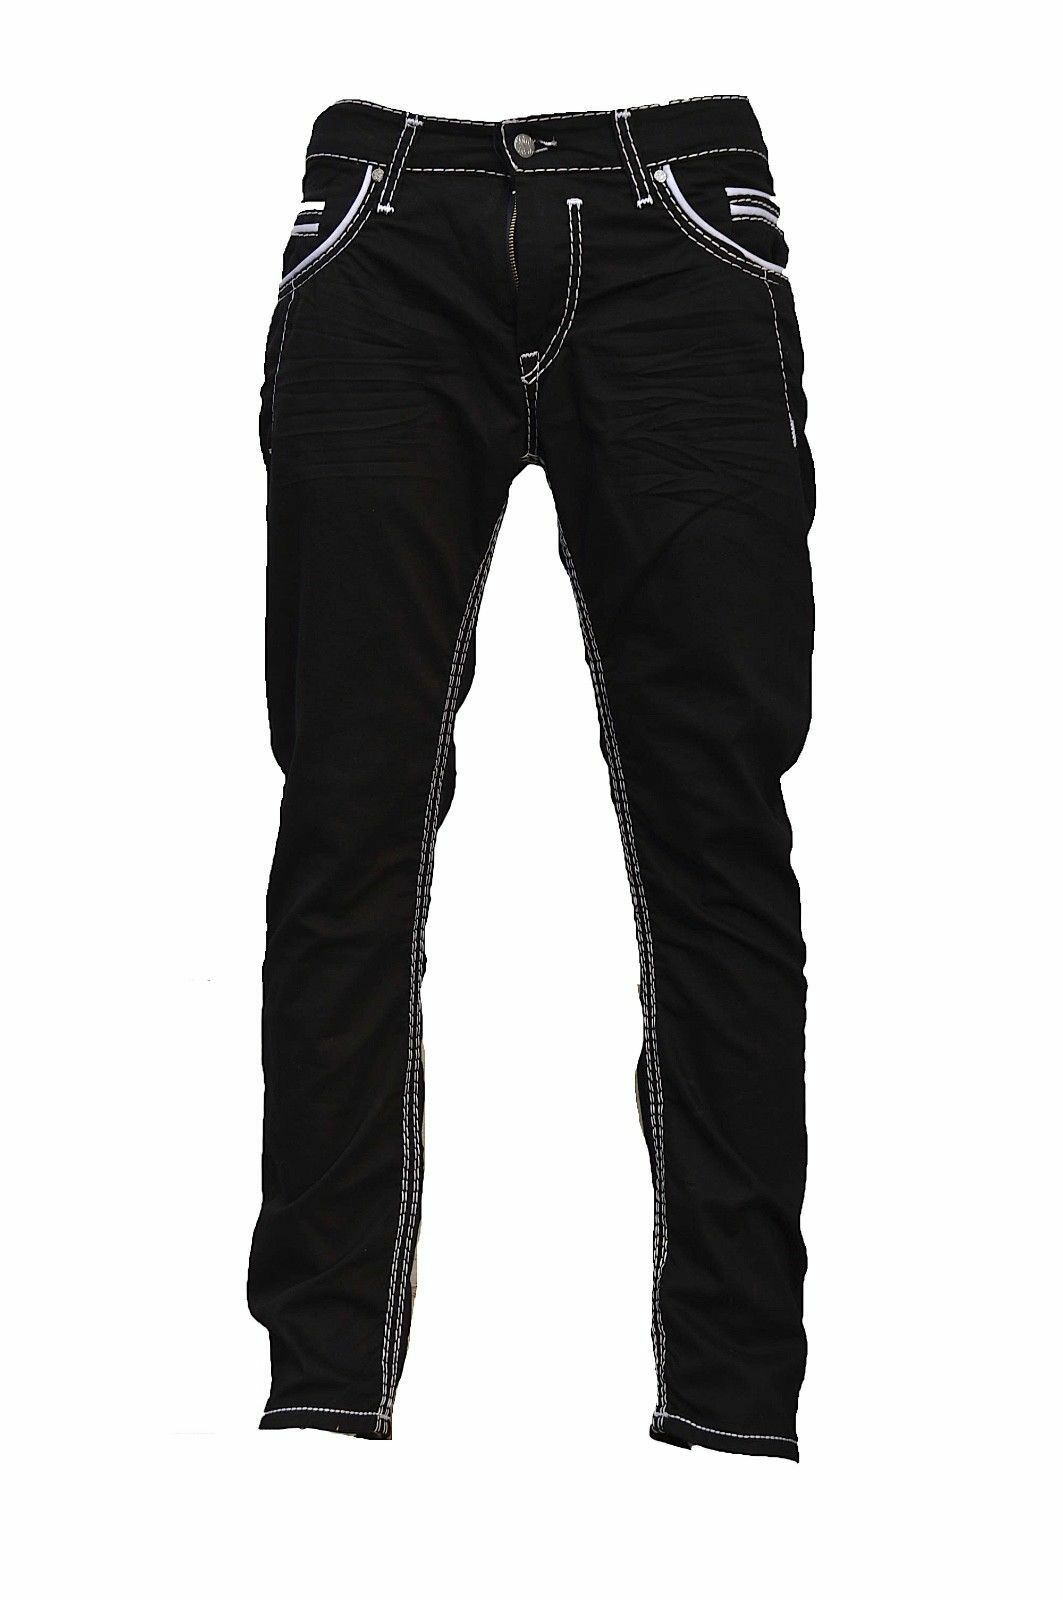 Herren-Jeans-Hose-Denim-KC-Black-Washed-Straight-Cut-Regular-Dicke-Naht-naehte Indexbild 12